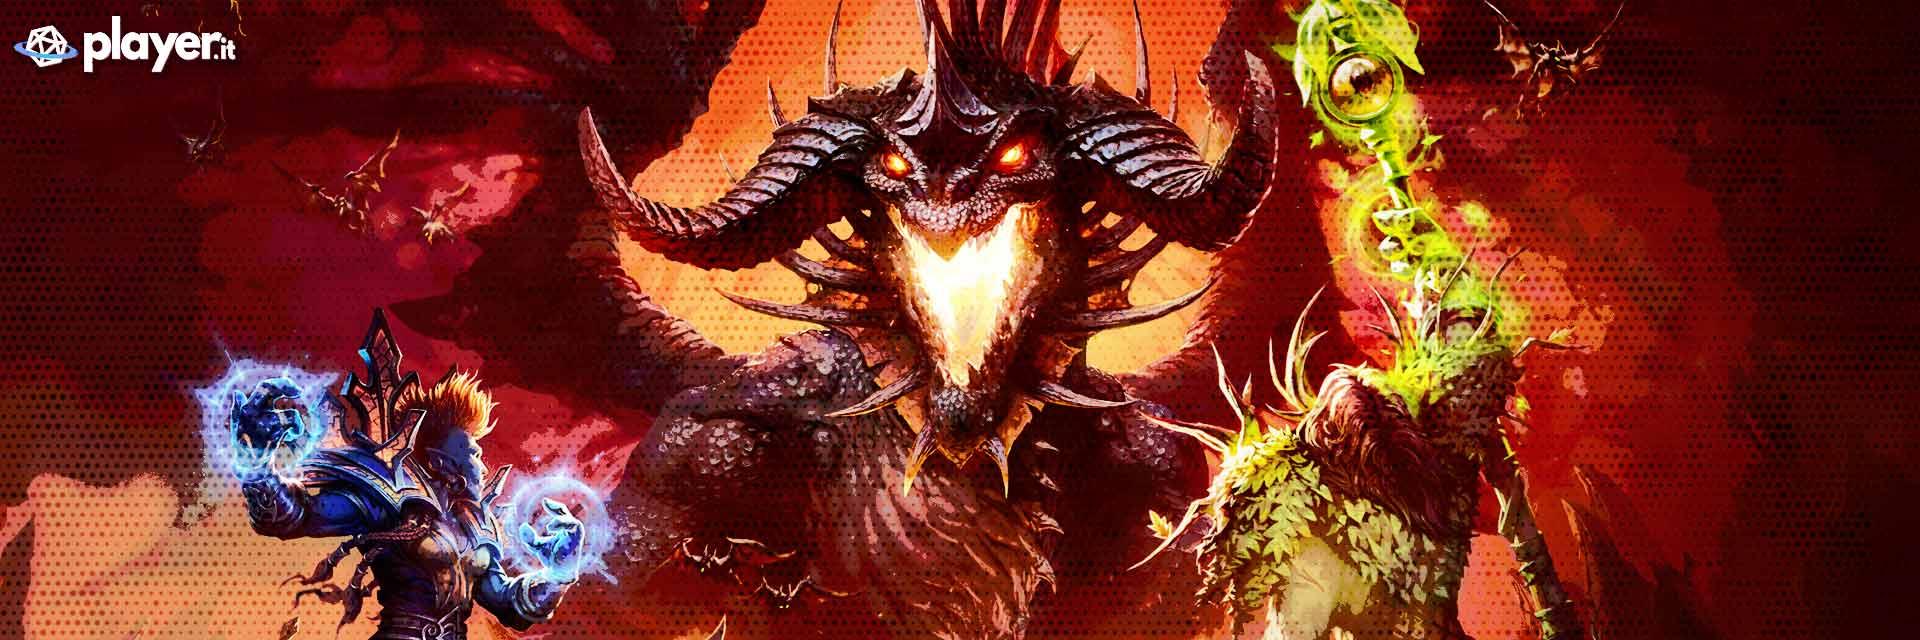 la copertina di world of warcraft